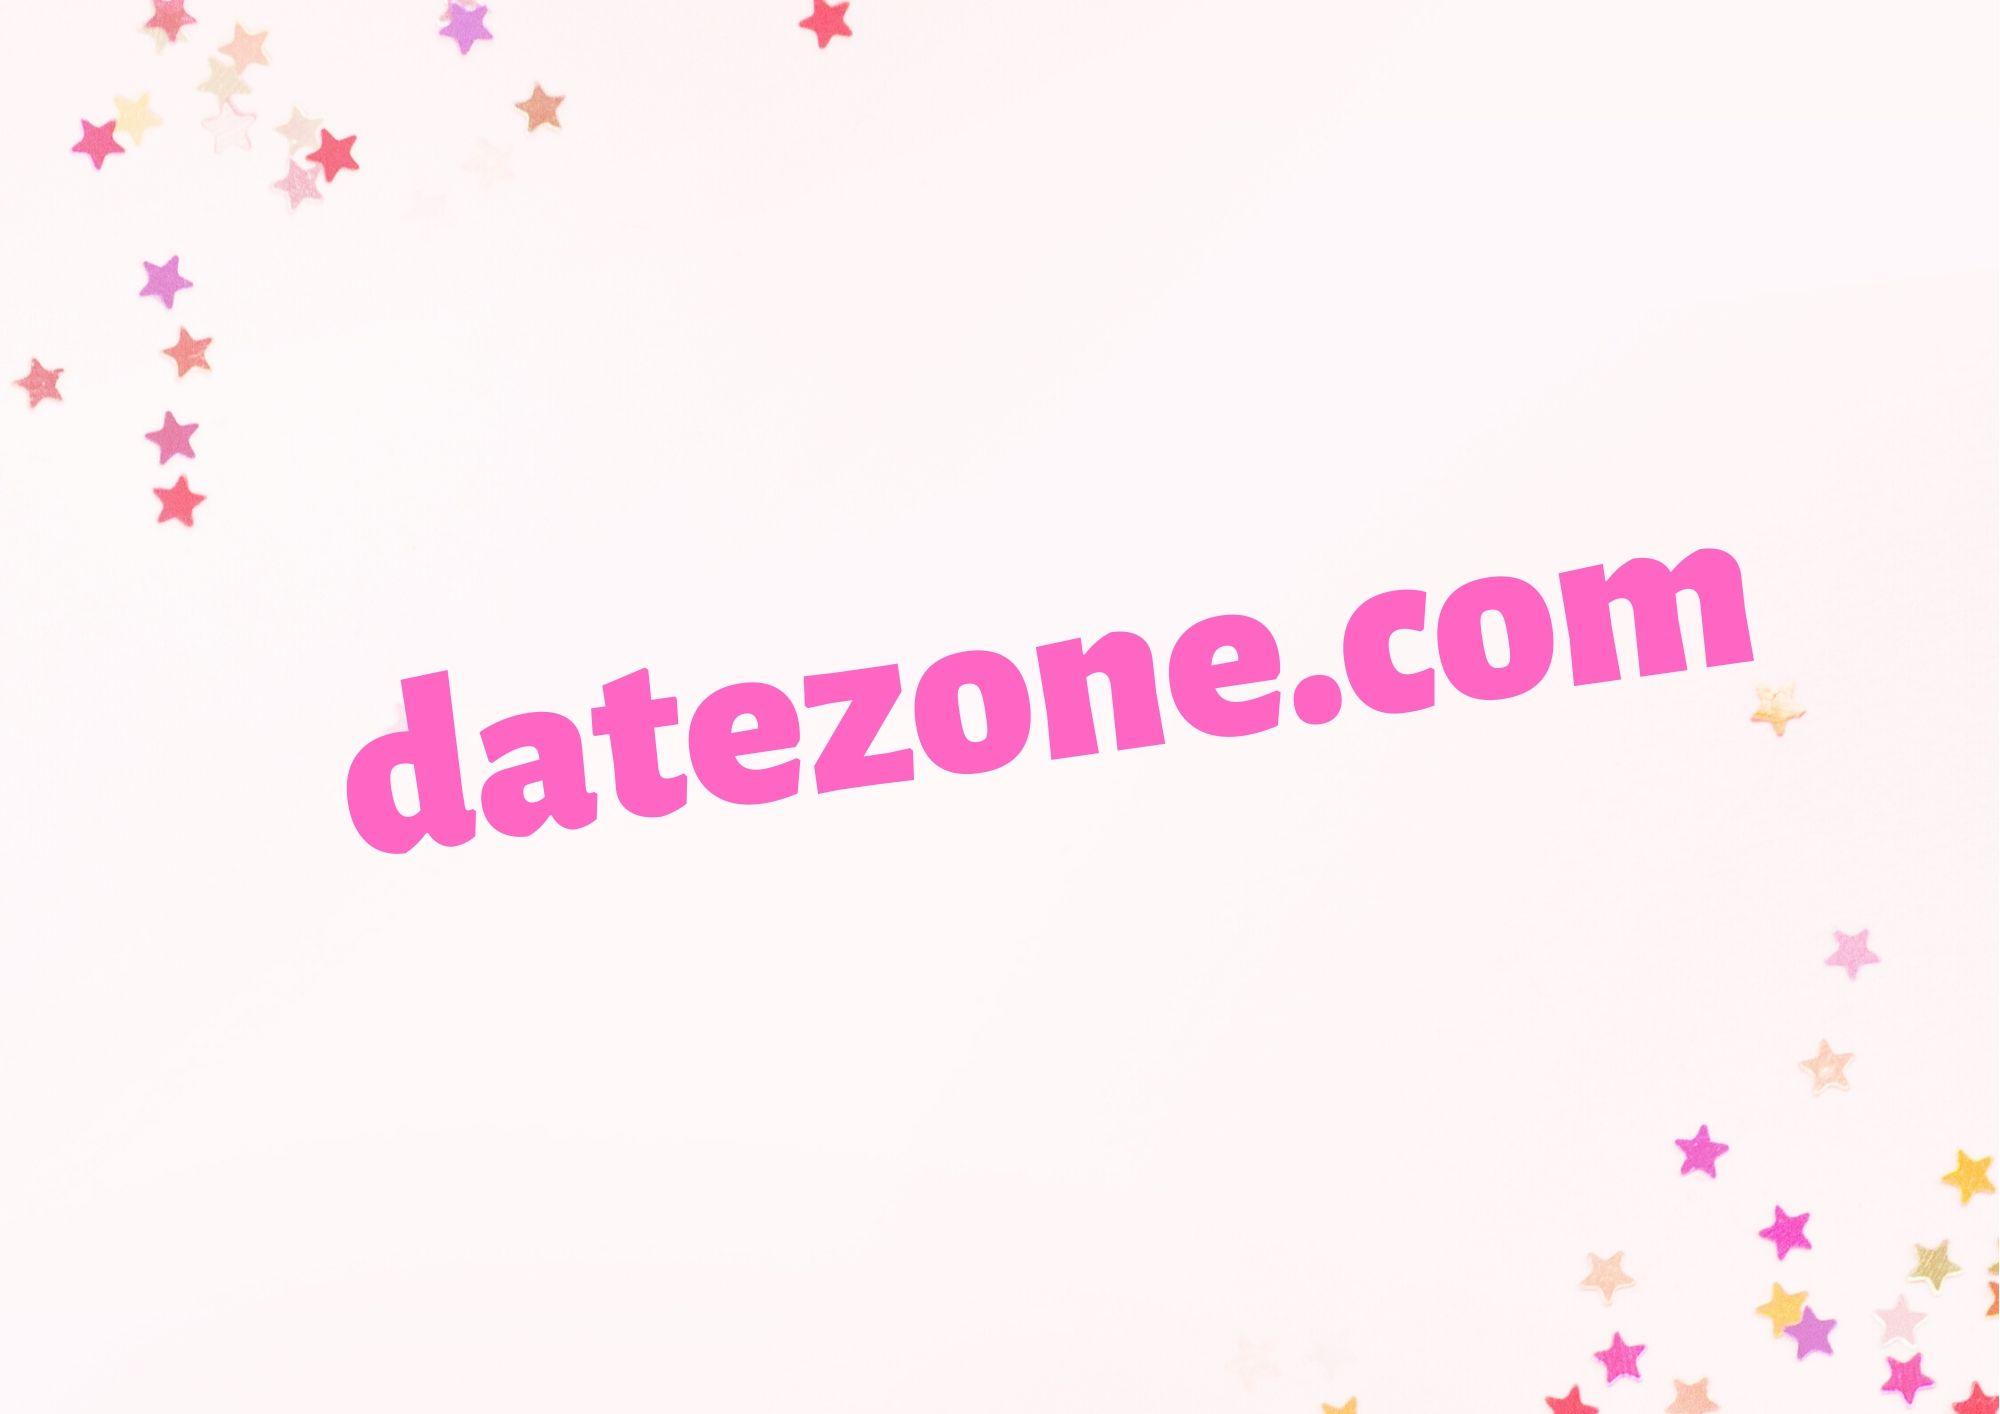 datezone.com